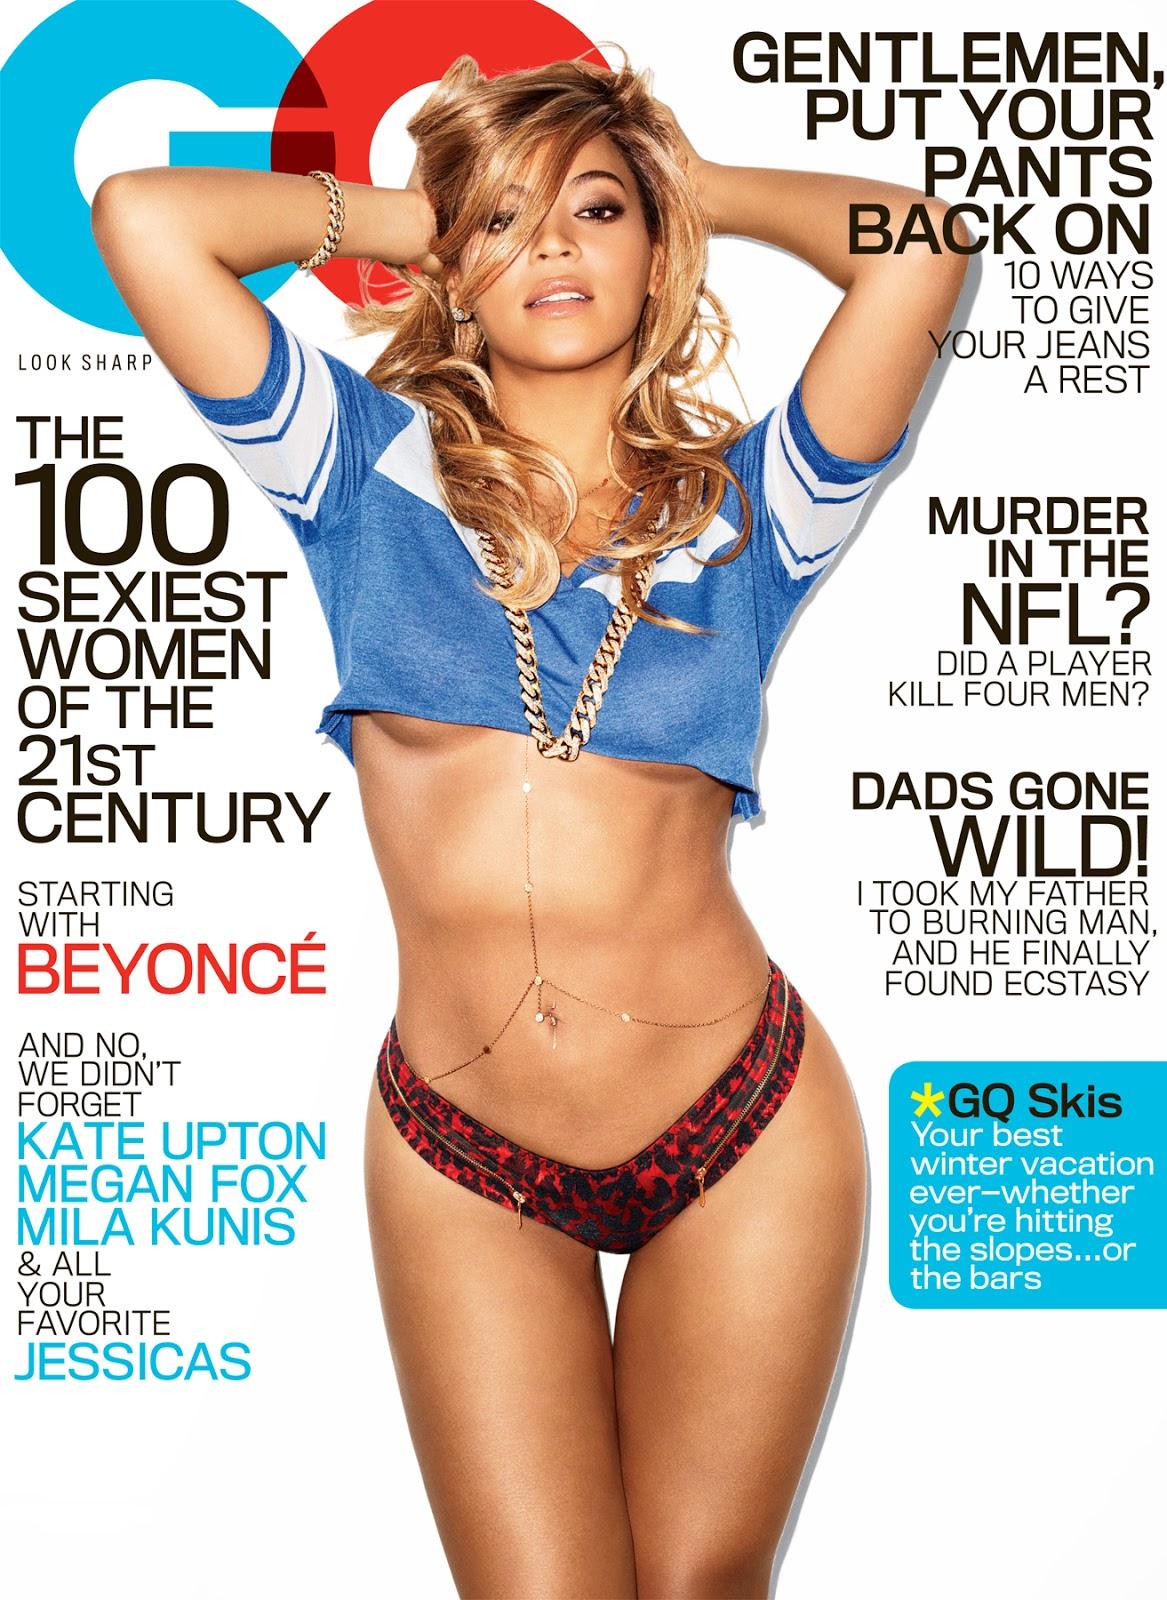 http://3.bp.blogspot.com/-sUbAB4NiZvc/US56mar6L5I/AAAAAAAAD3M/ZuJvQ2sykKQ/s1600/Beyonce+2013+February+GQ+cover.jpg